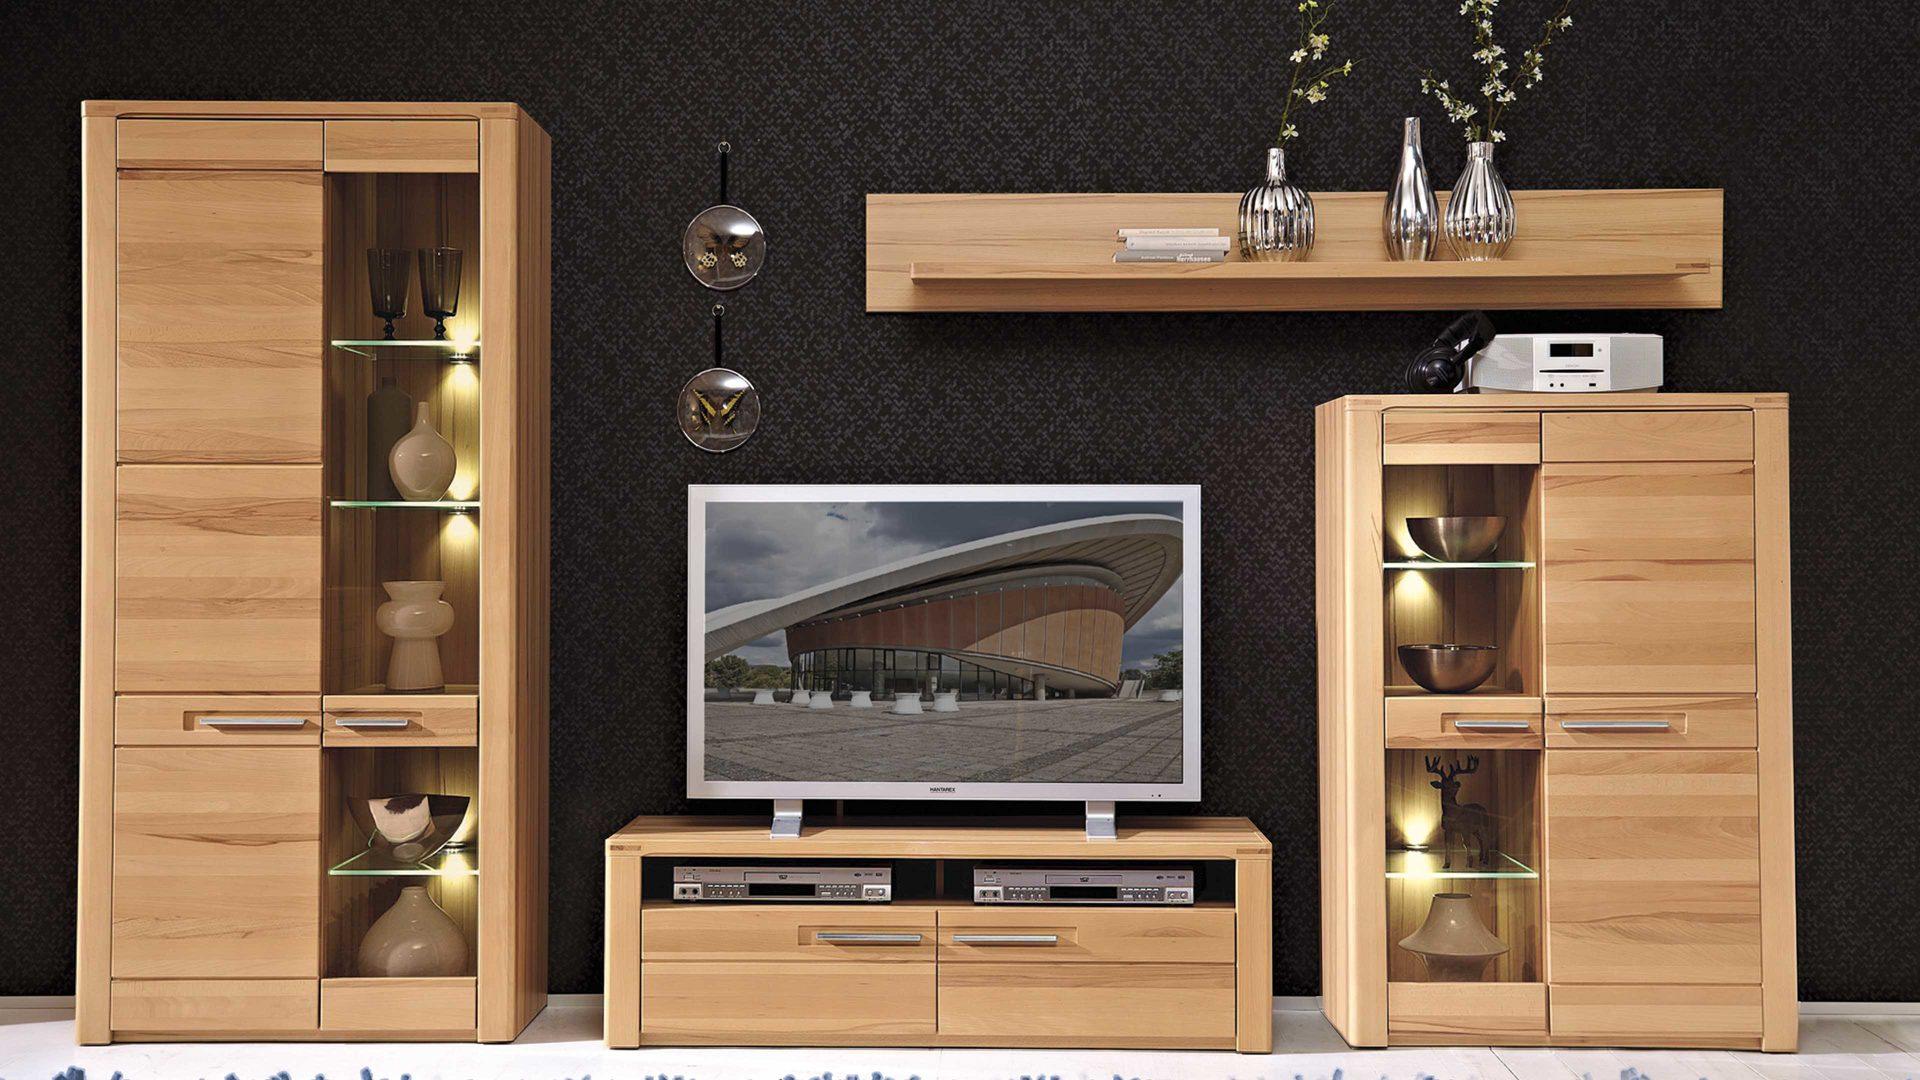 Fesselnd Affordable Details Wohnwand Mit Als With Wohnwand Mit Led Beleuchtung